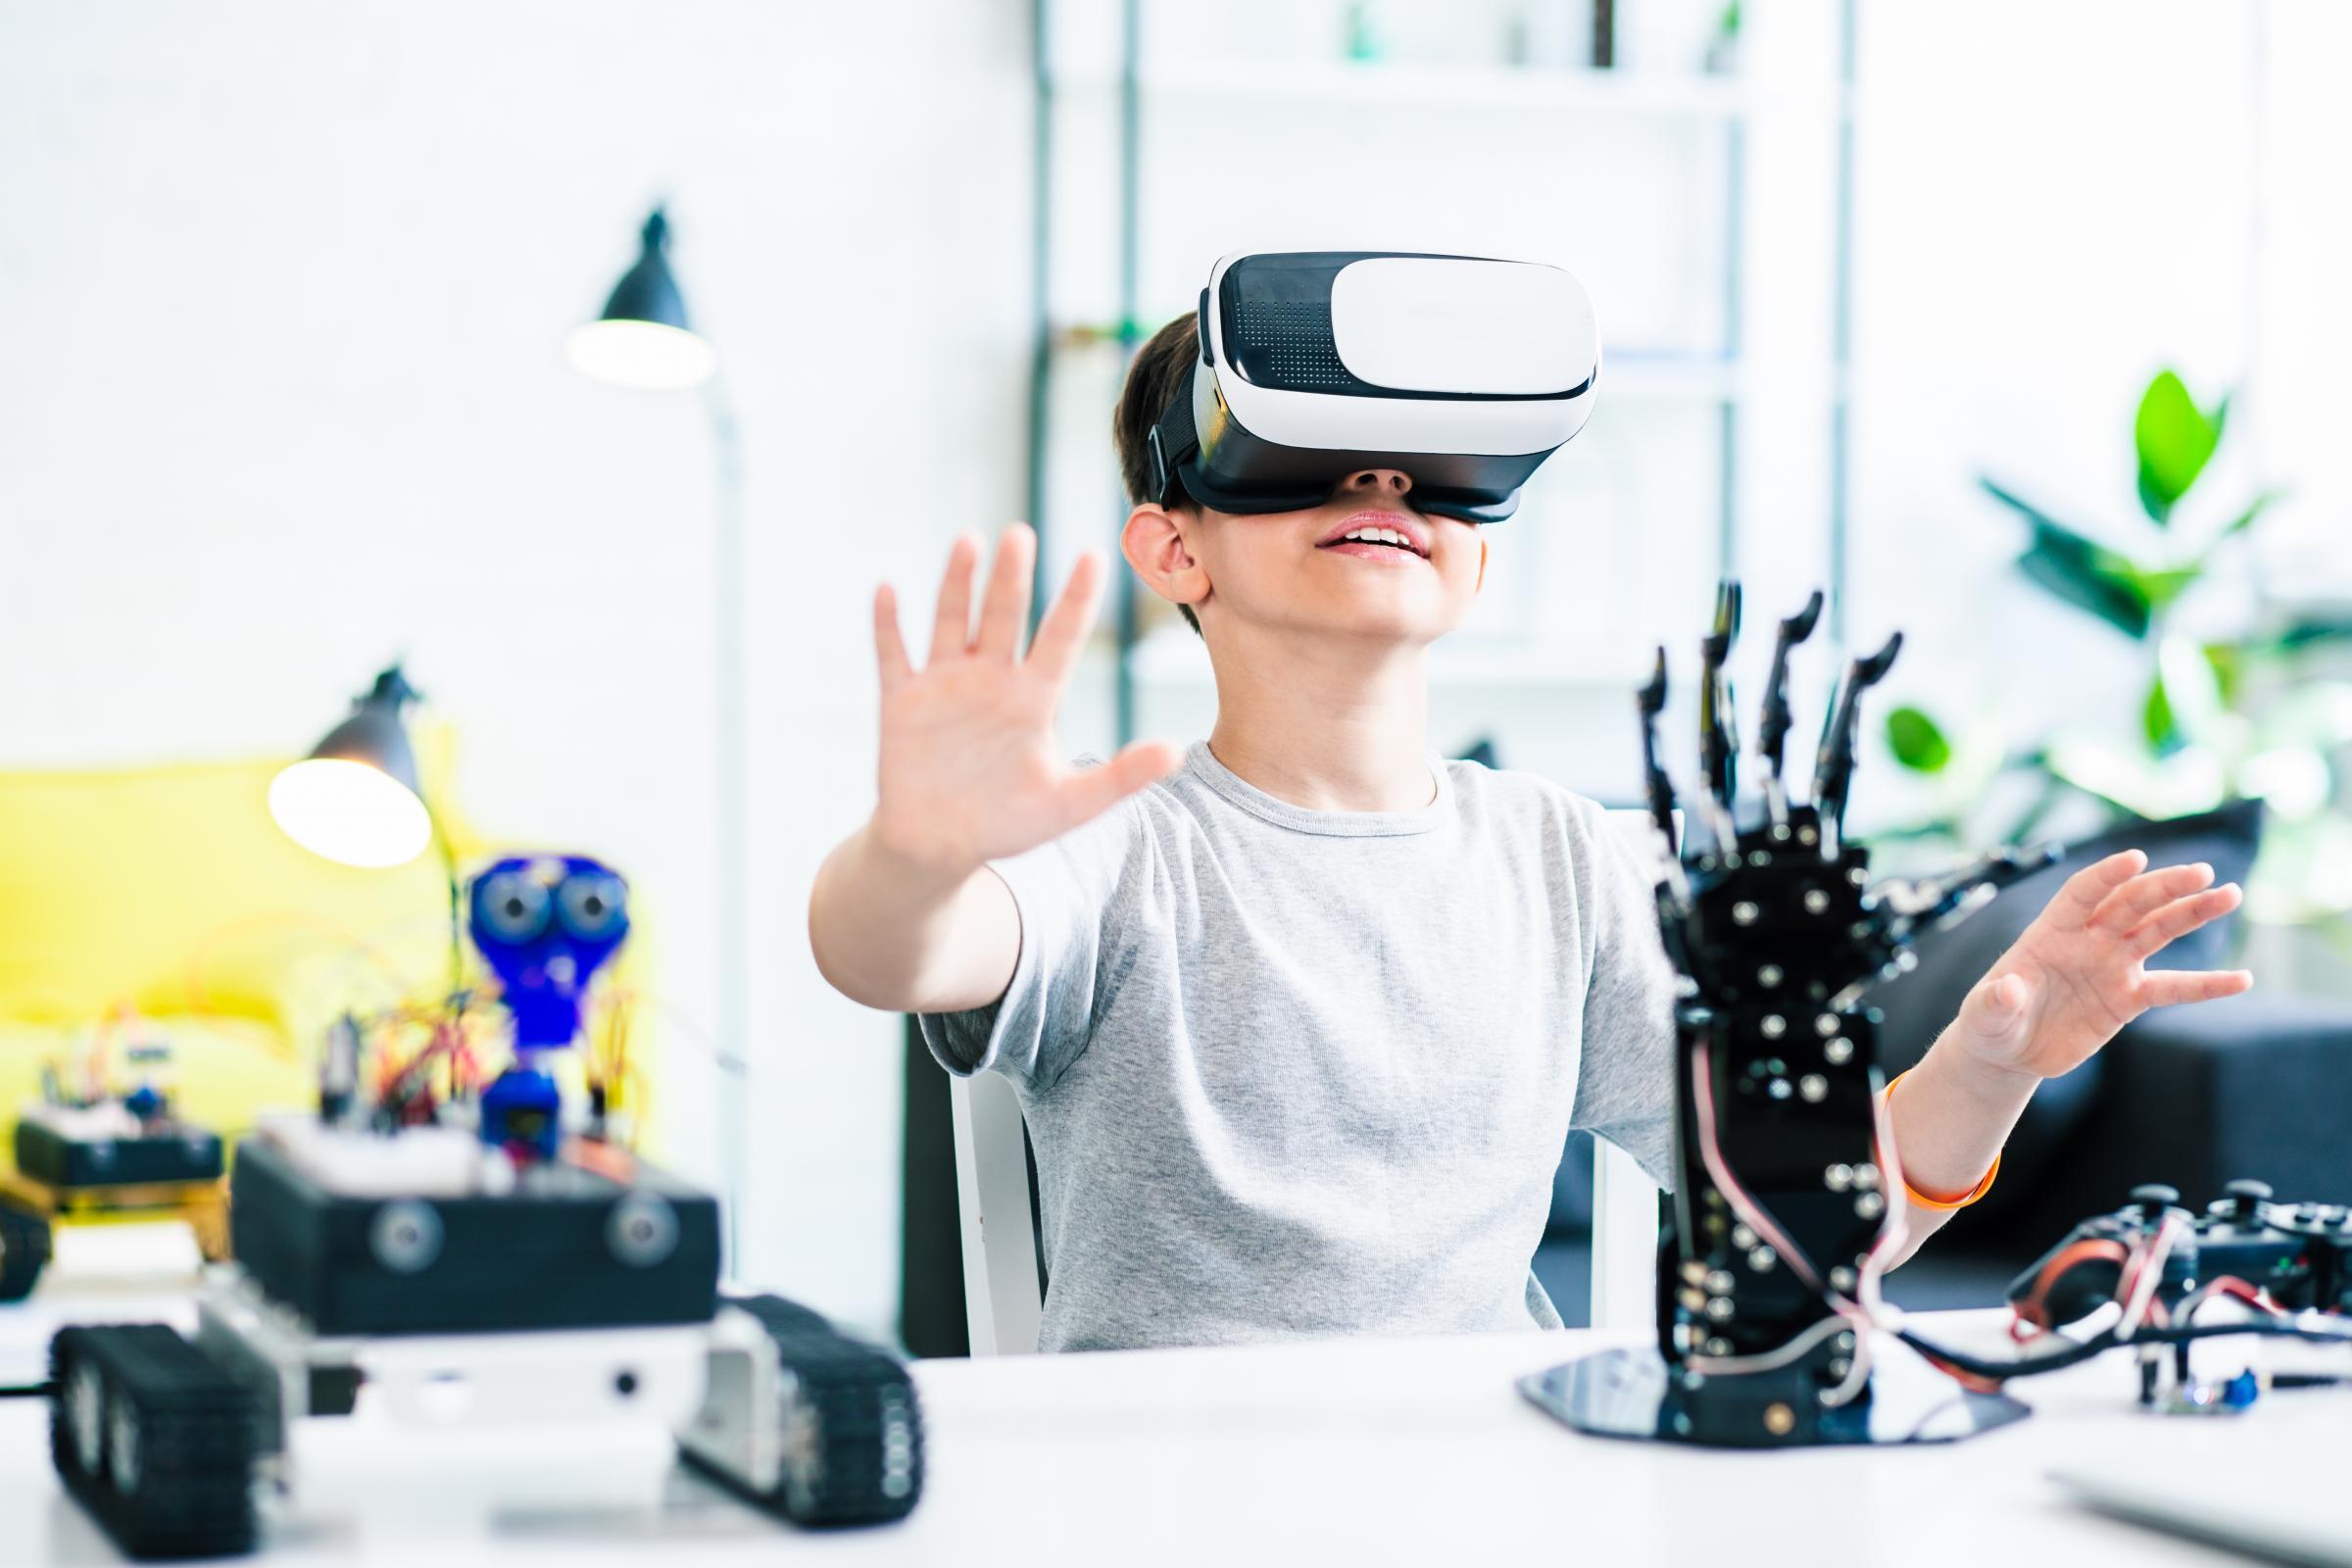 Lilliput pupils learn through virtual reality